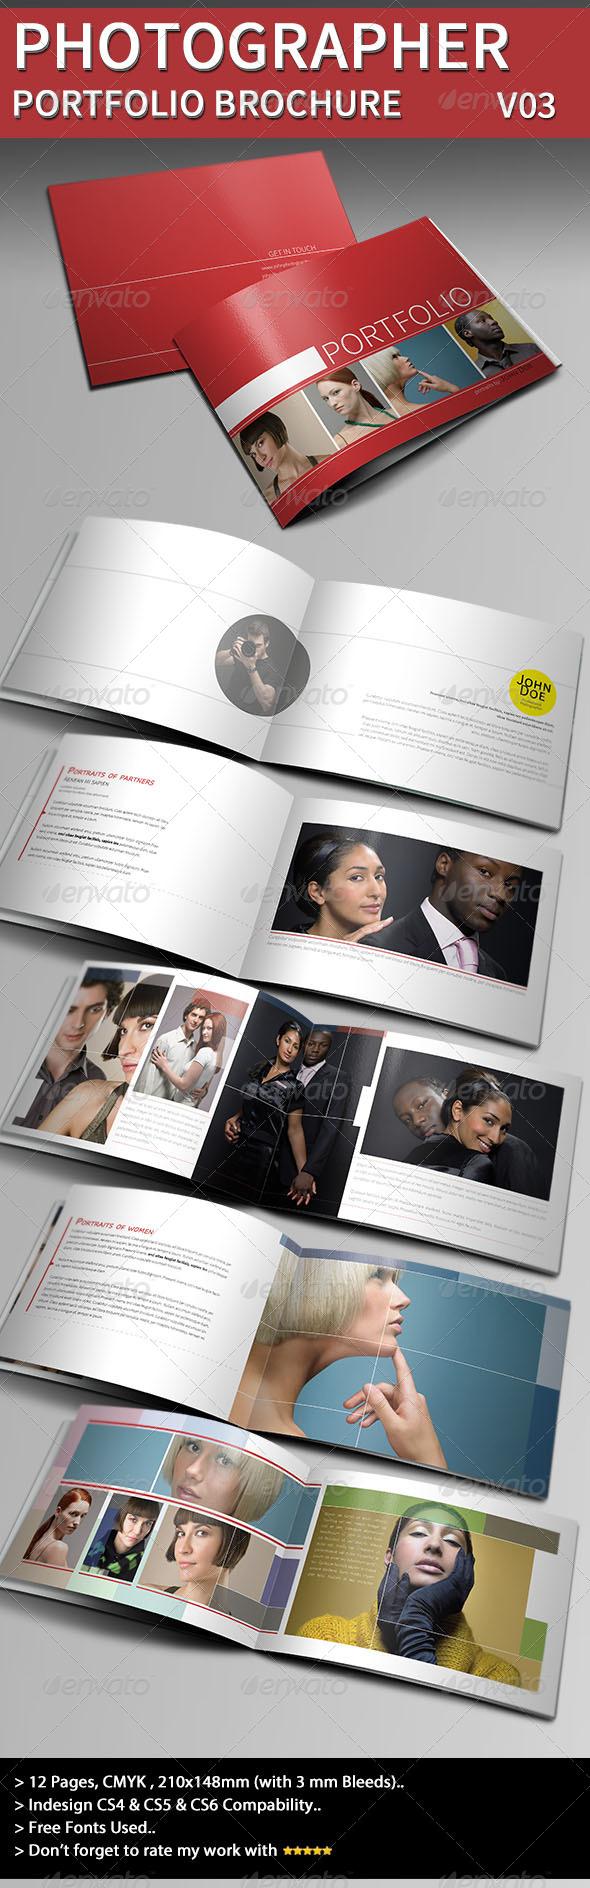 GraphicRiver Photographer Portfolio Brochure Template III 4102425